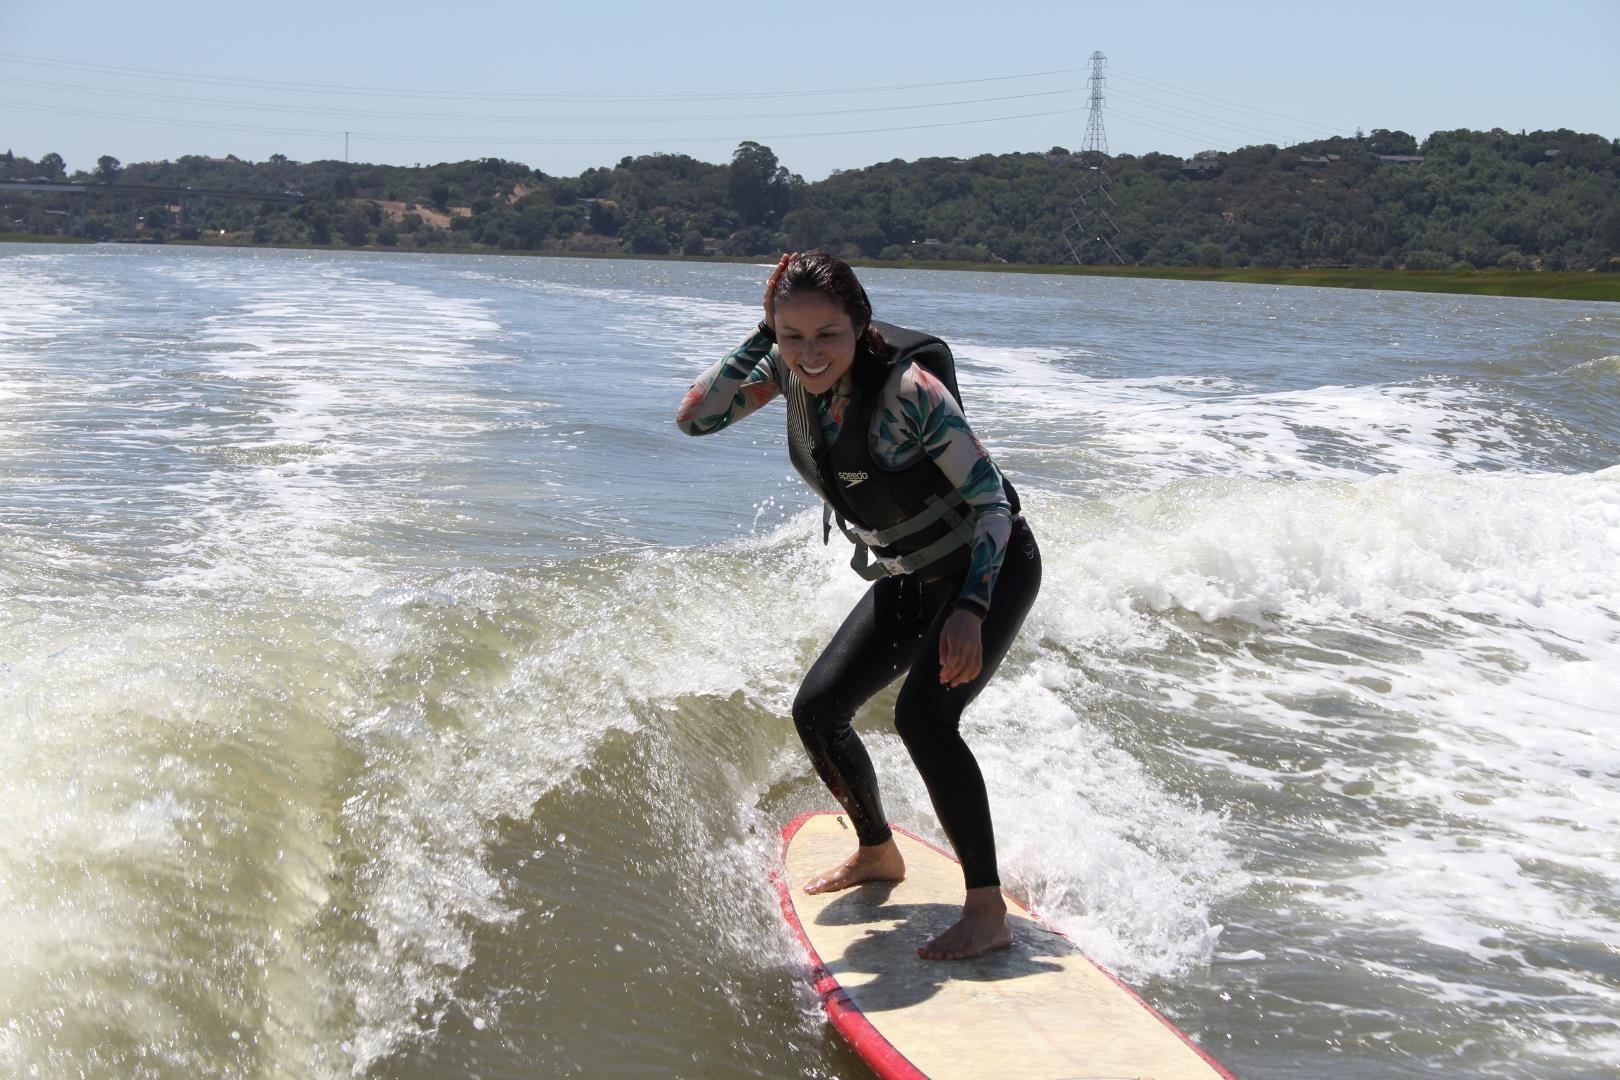 surf technique training face of joy fixing hair